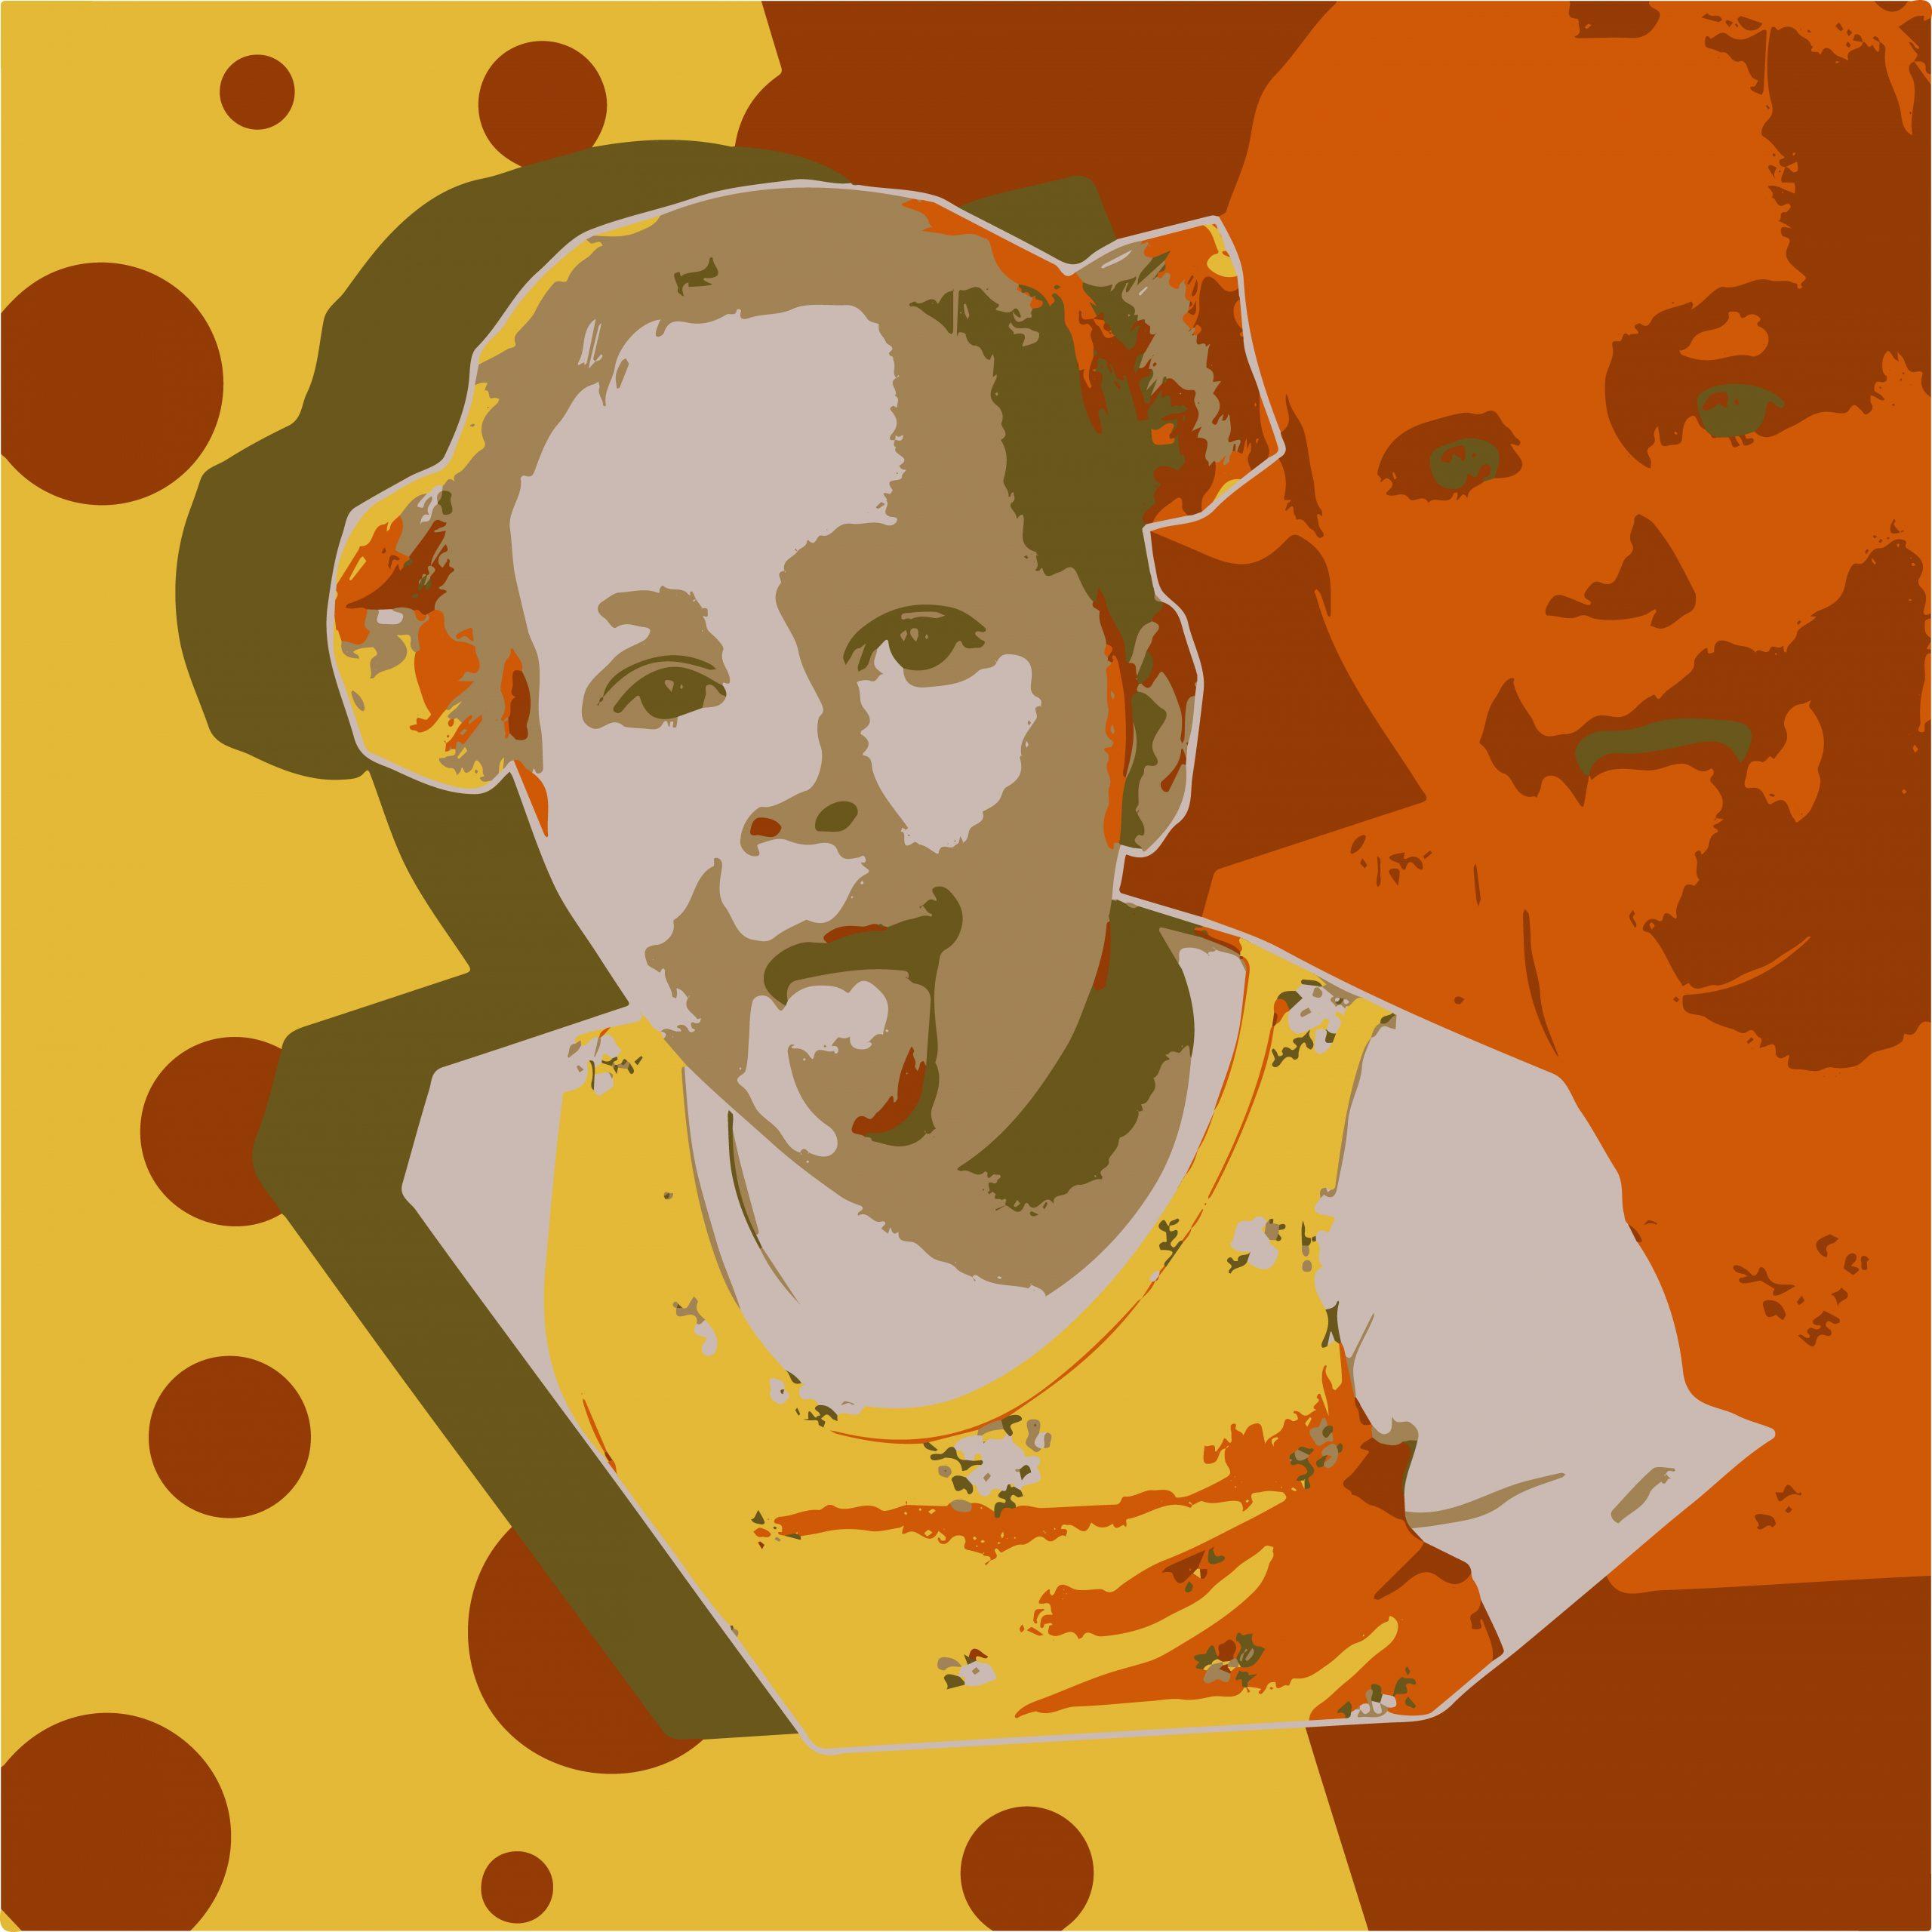 Portrait illustration of a kid